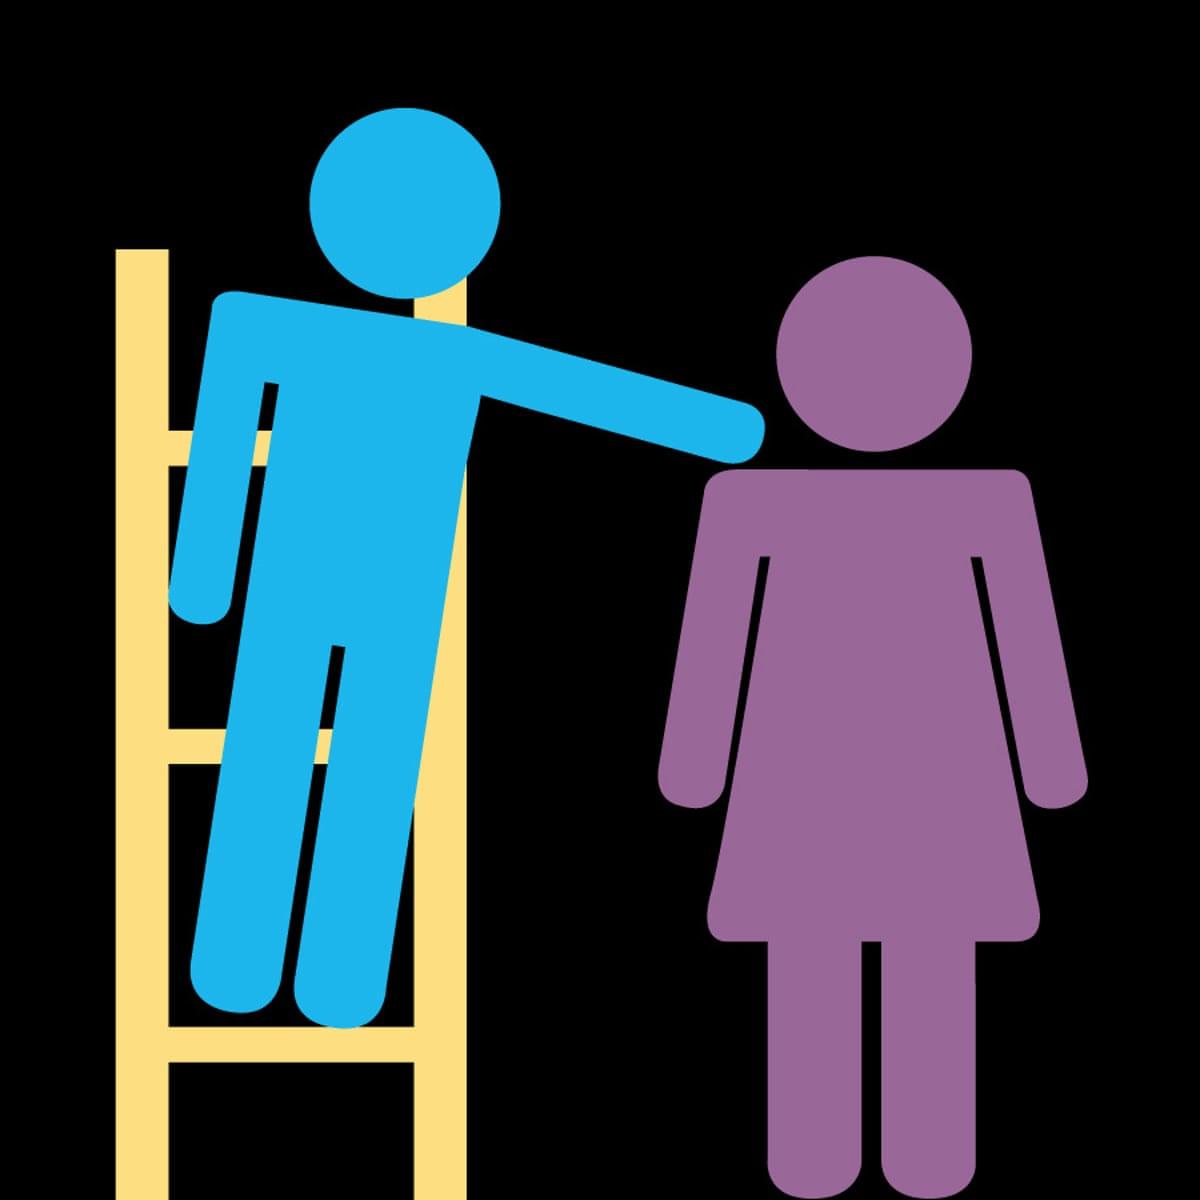 Australia S Gender Pay Gap Still 14 With Men Earning 240 More A Week Than Women World News The Guardian